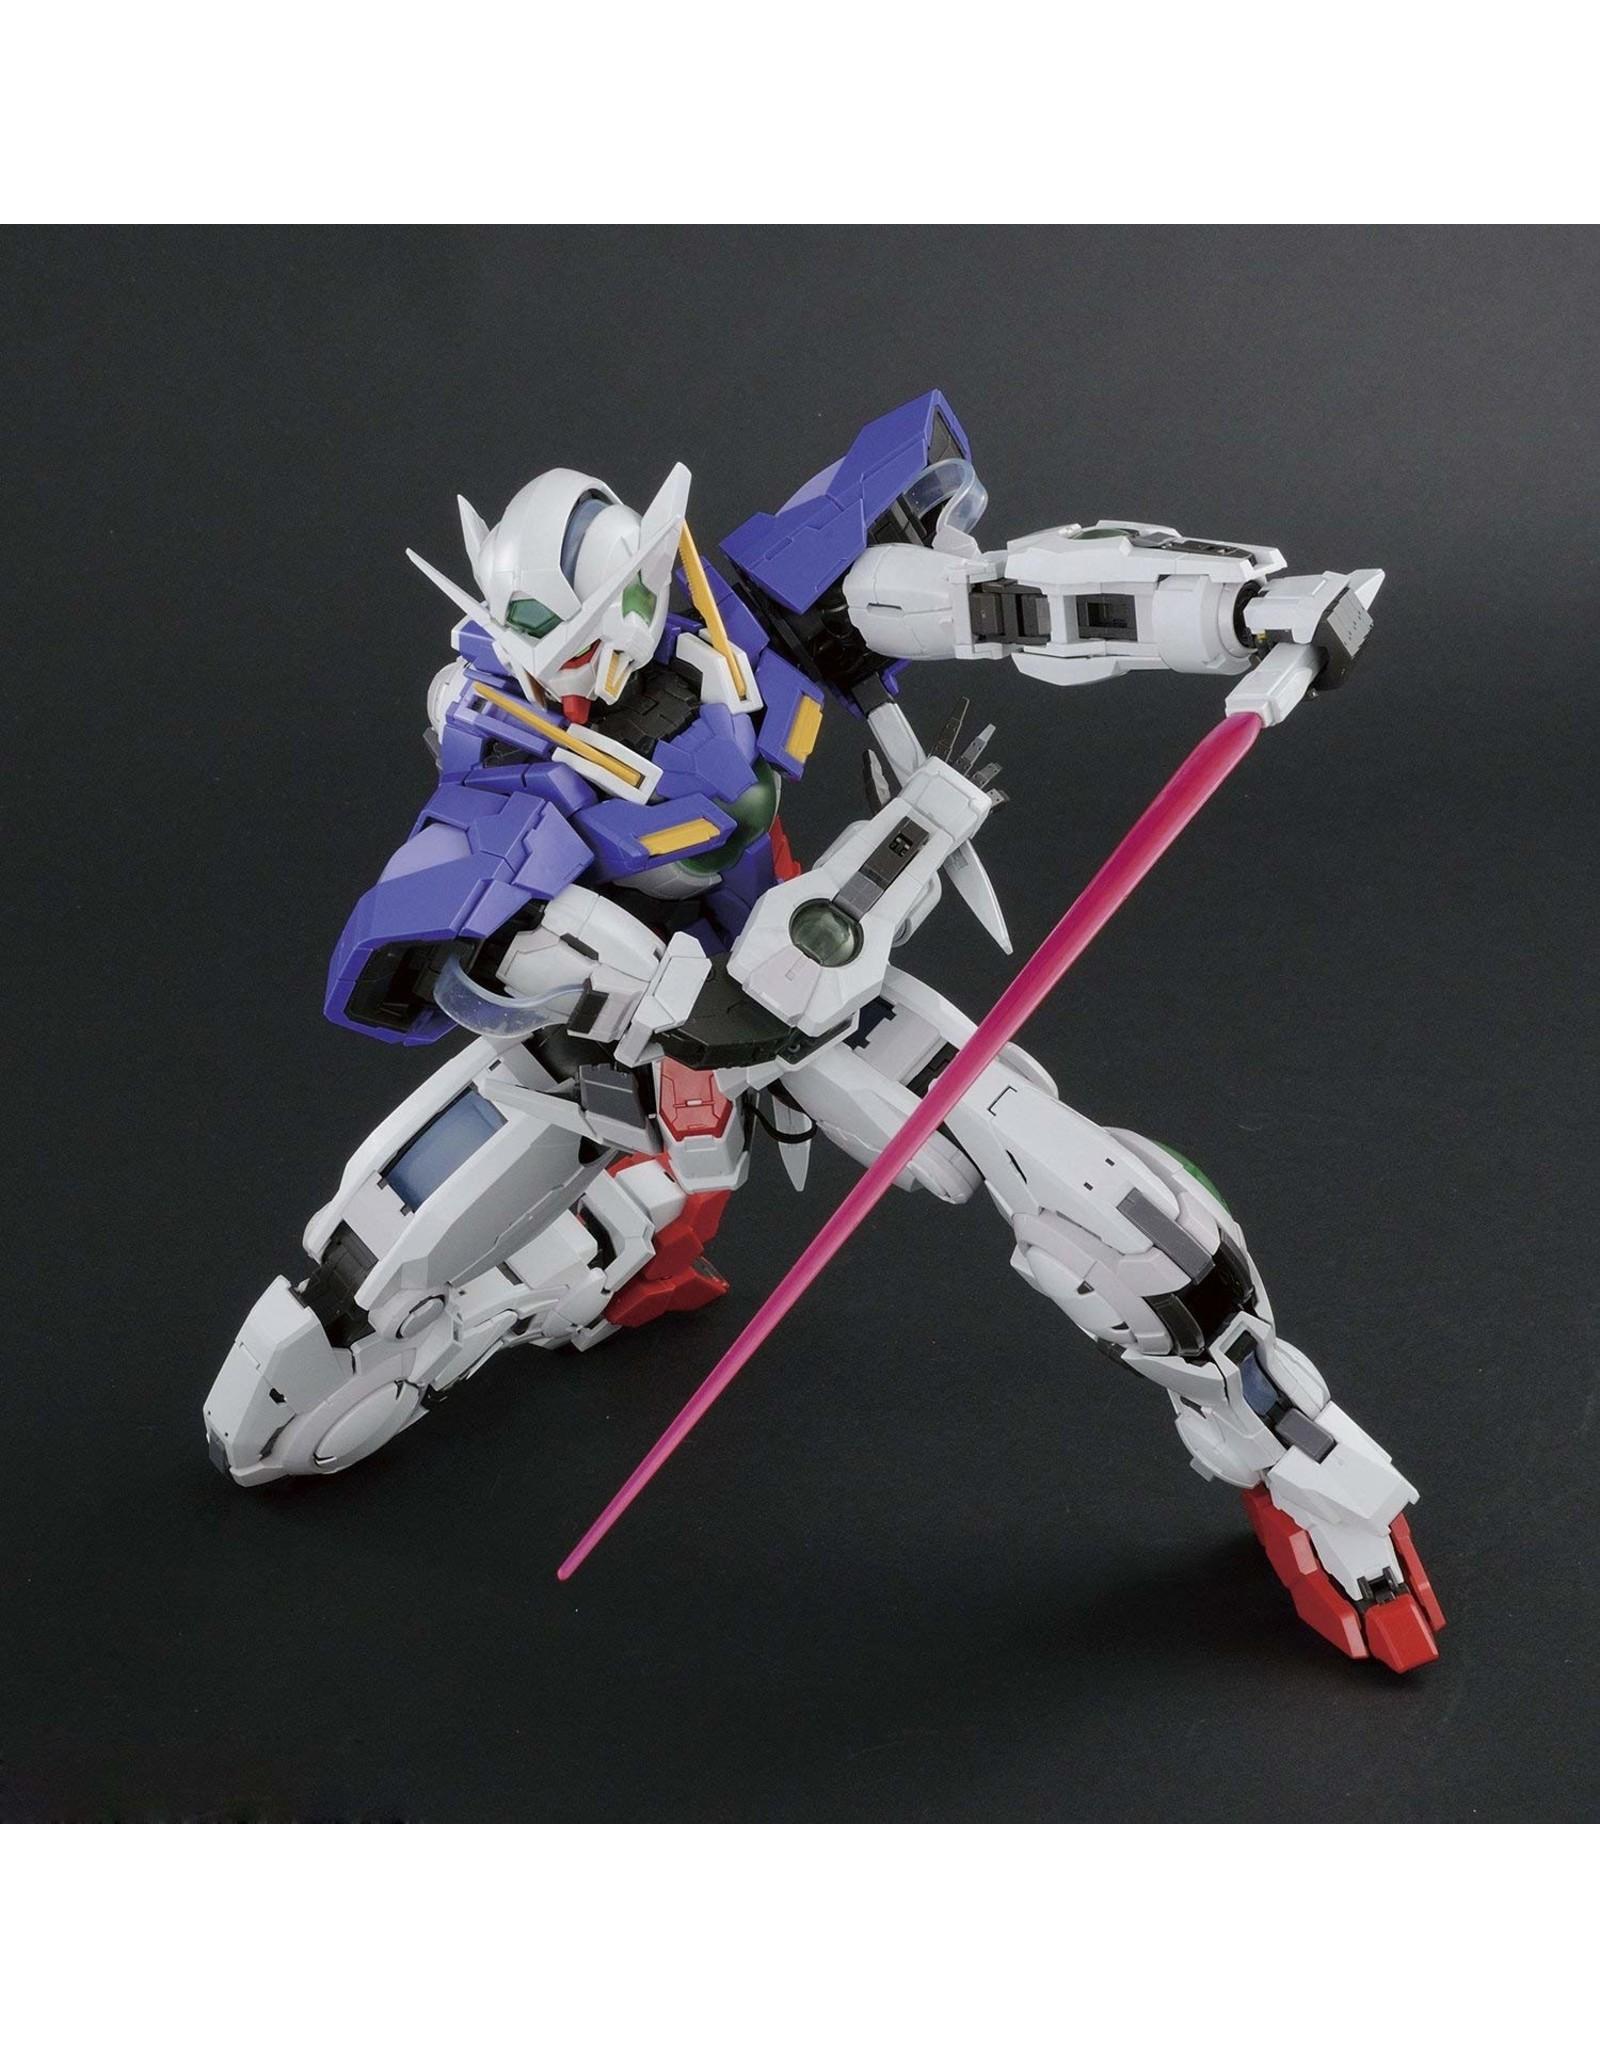 Bandai GN-001 Gundam Exia PG